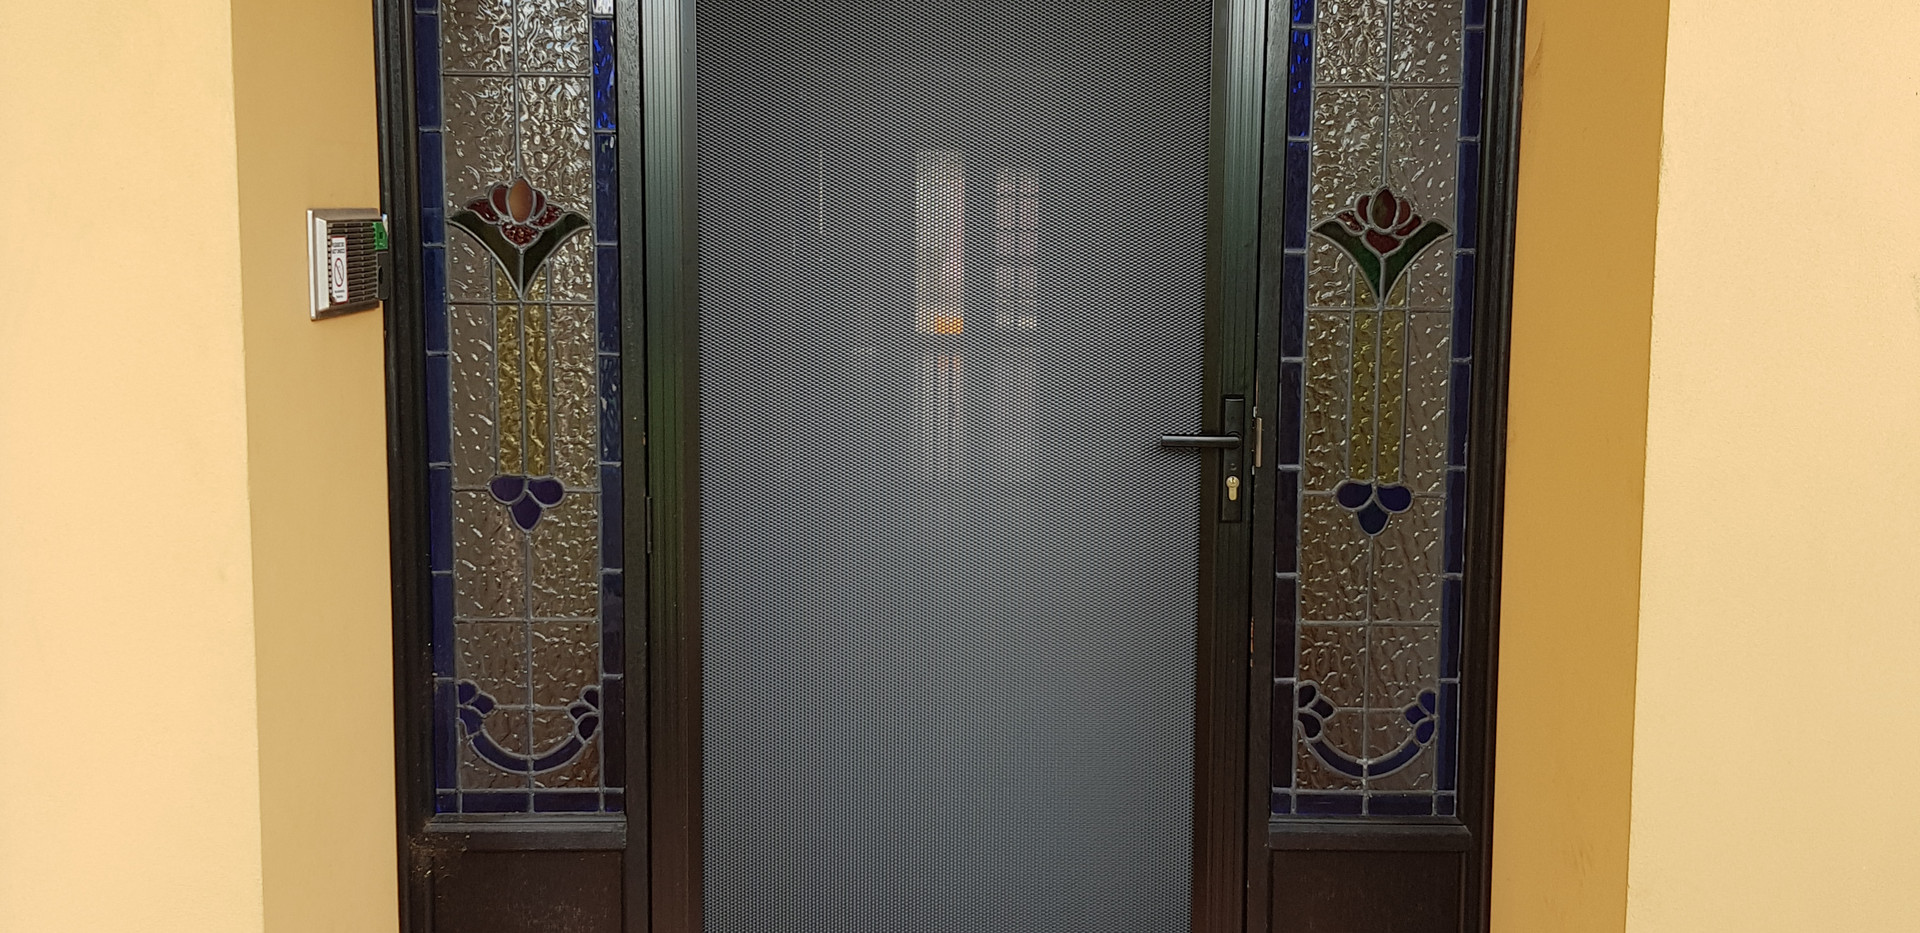 Vision Gard Hinged Security Doors